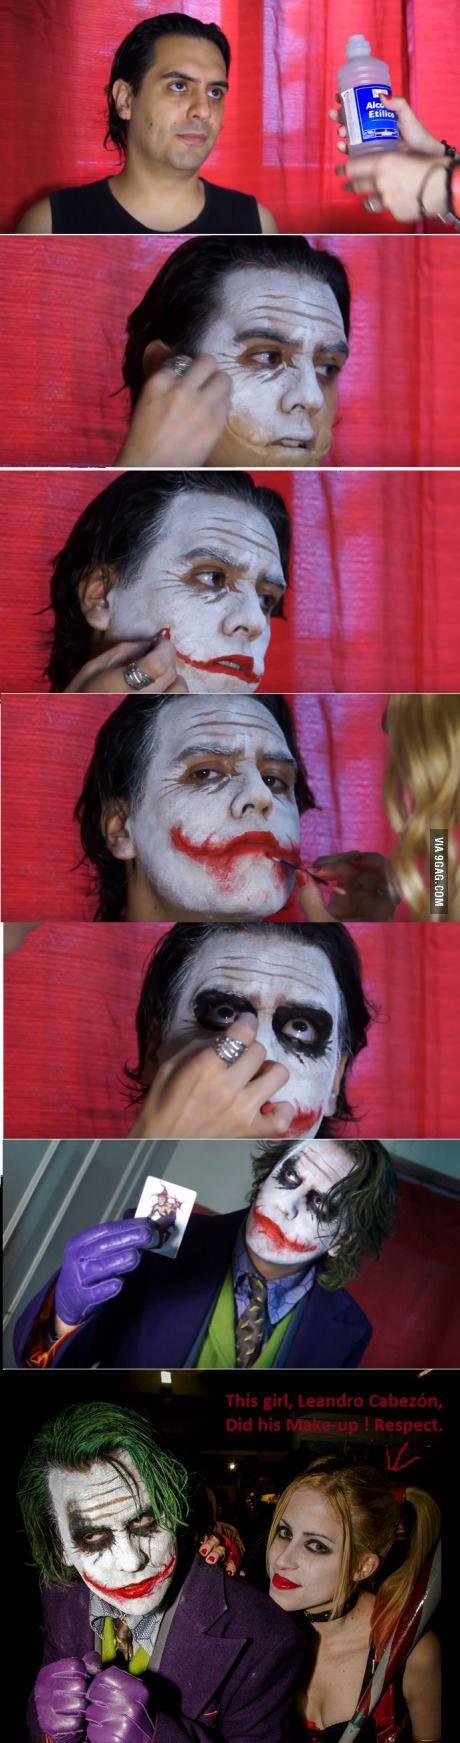 Amazing Joker Cosplay, make-up by Leandro Cabezón.